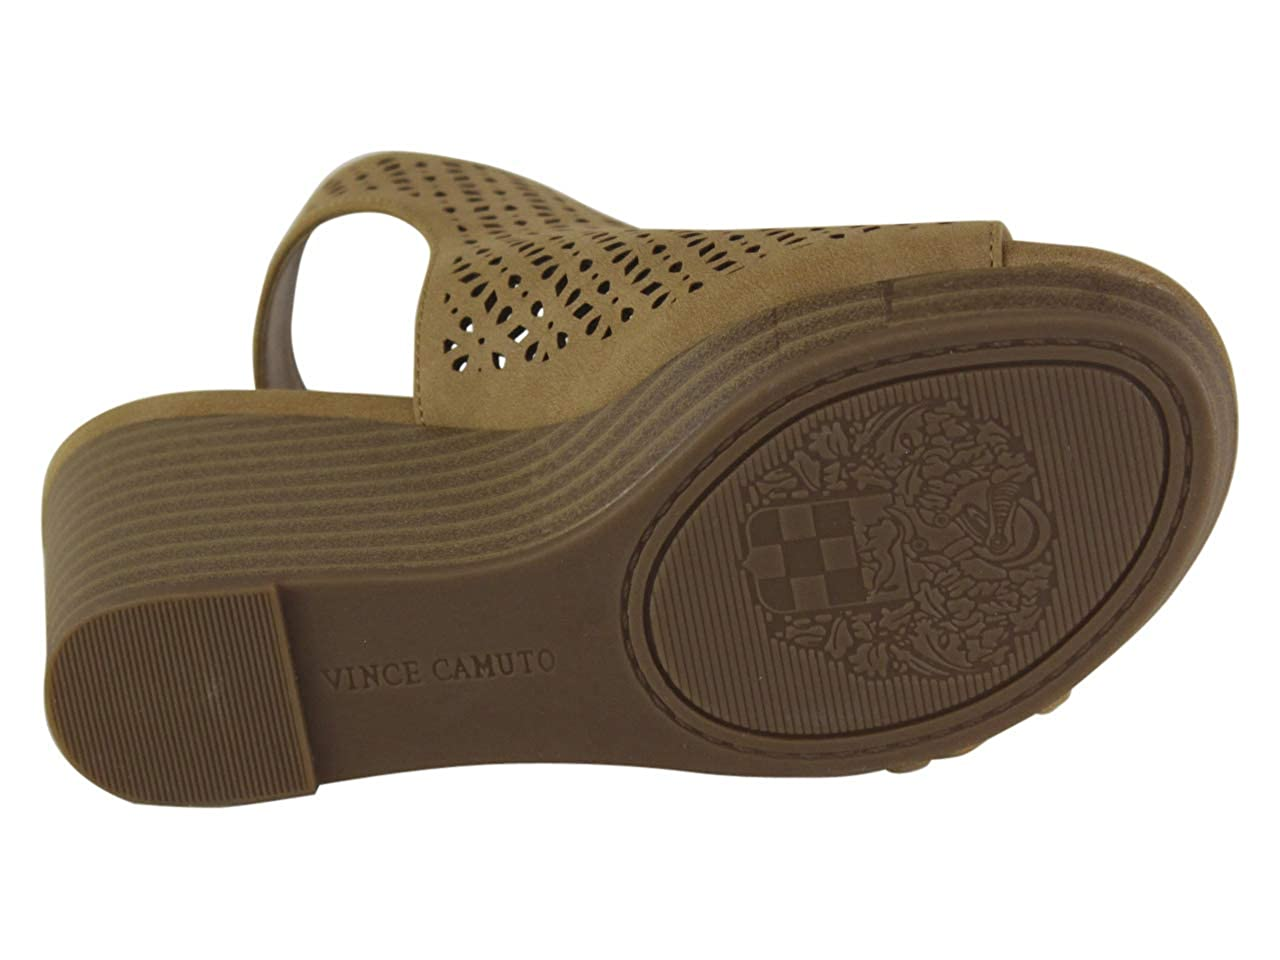 46413e7e37 Amazon.com | Vince Camuto Little/Big Girl's Obal Wedge Sandals Shoes |  Sandals